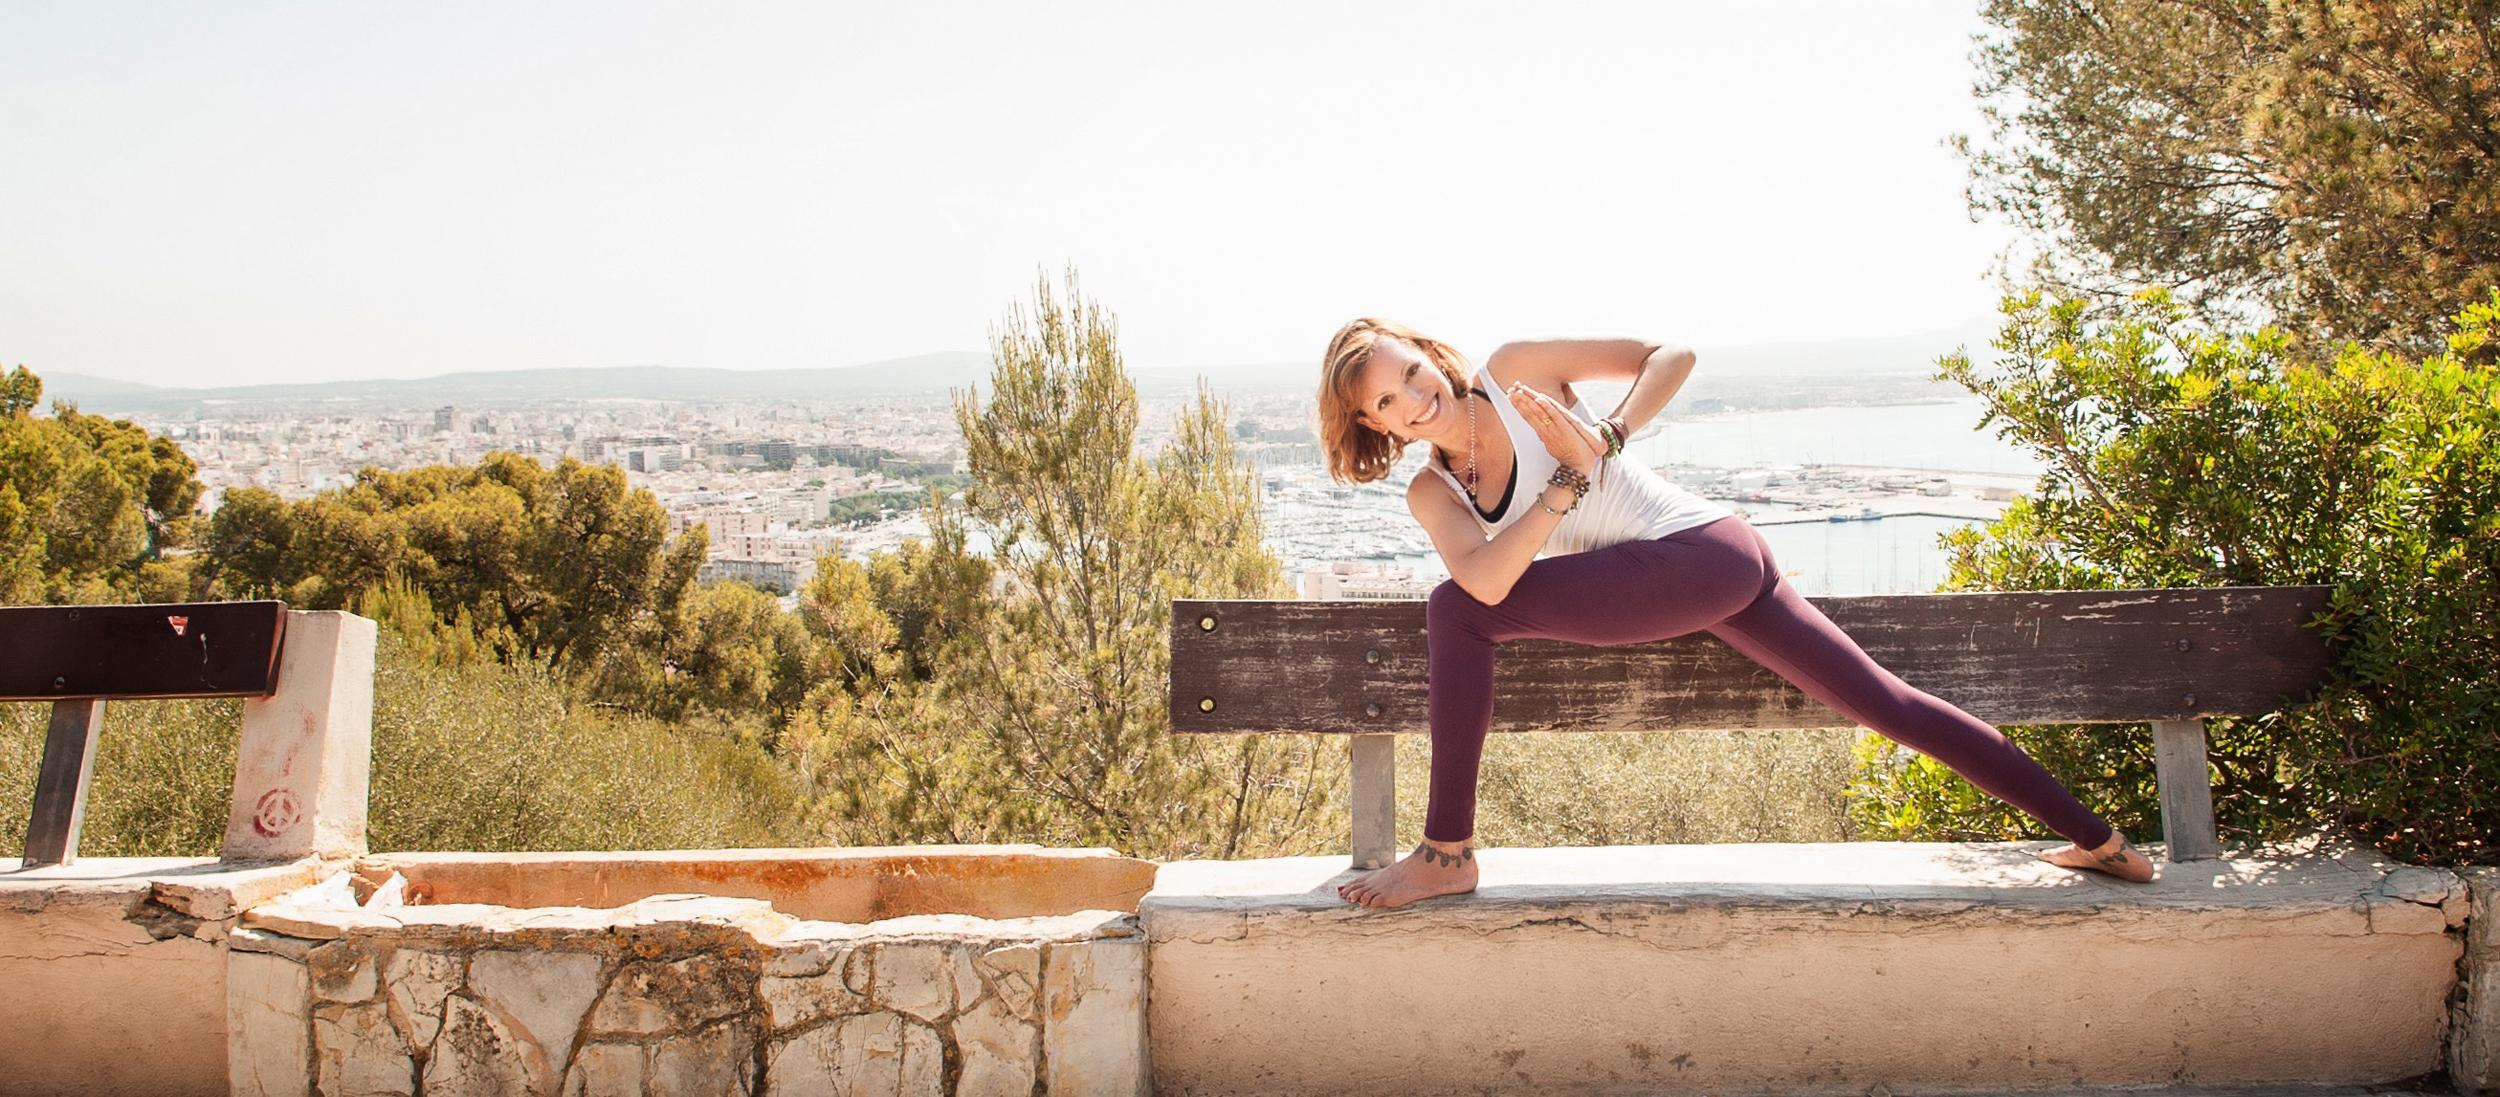 Yogaworks 200-HR Online Teacher Training: May 4 – June 11, 2020